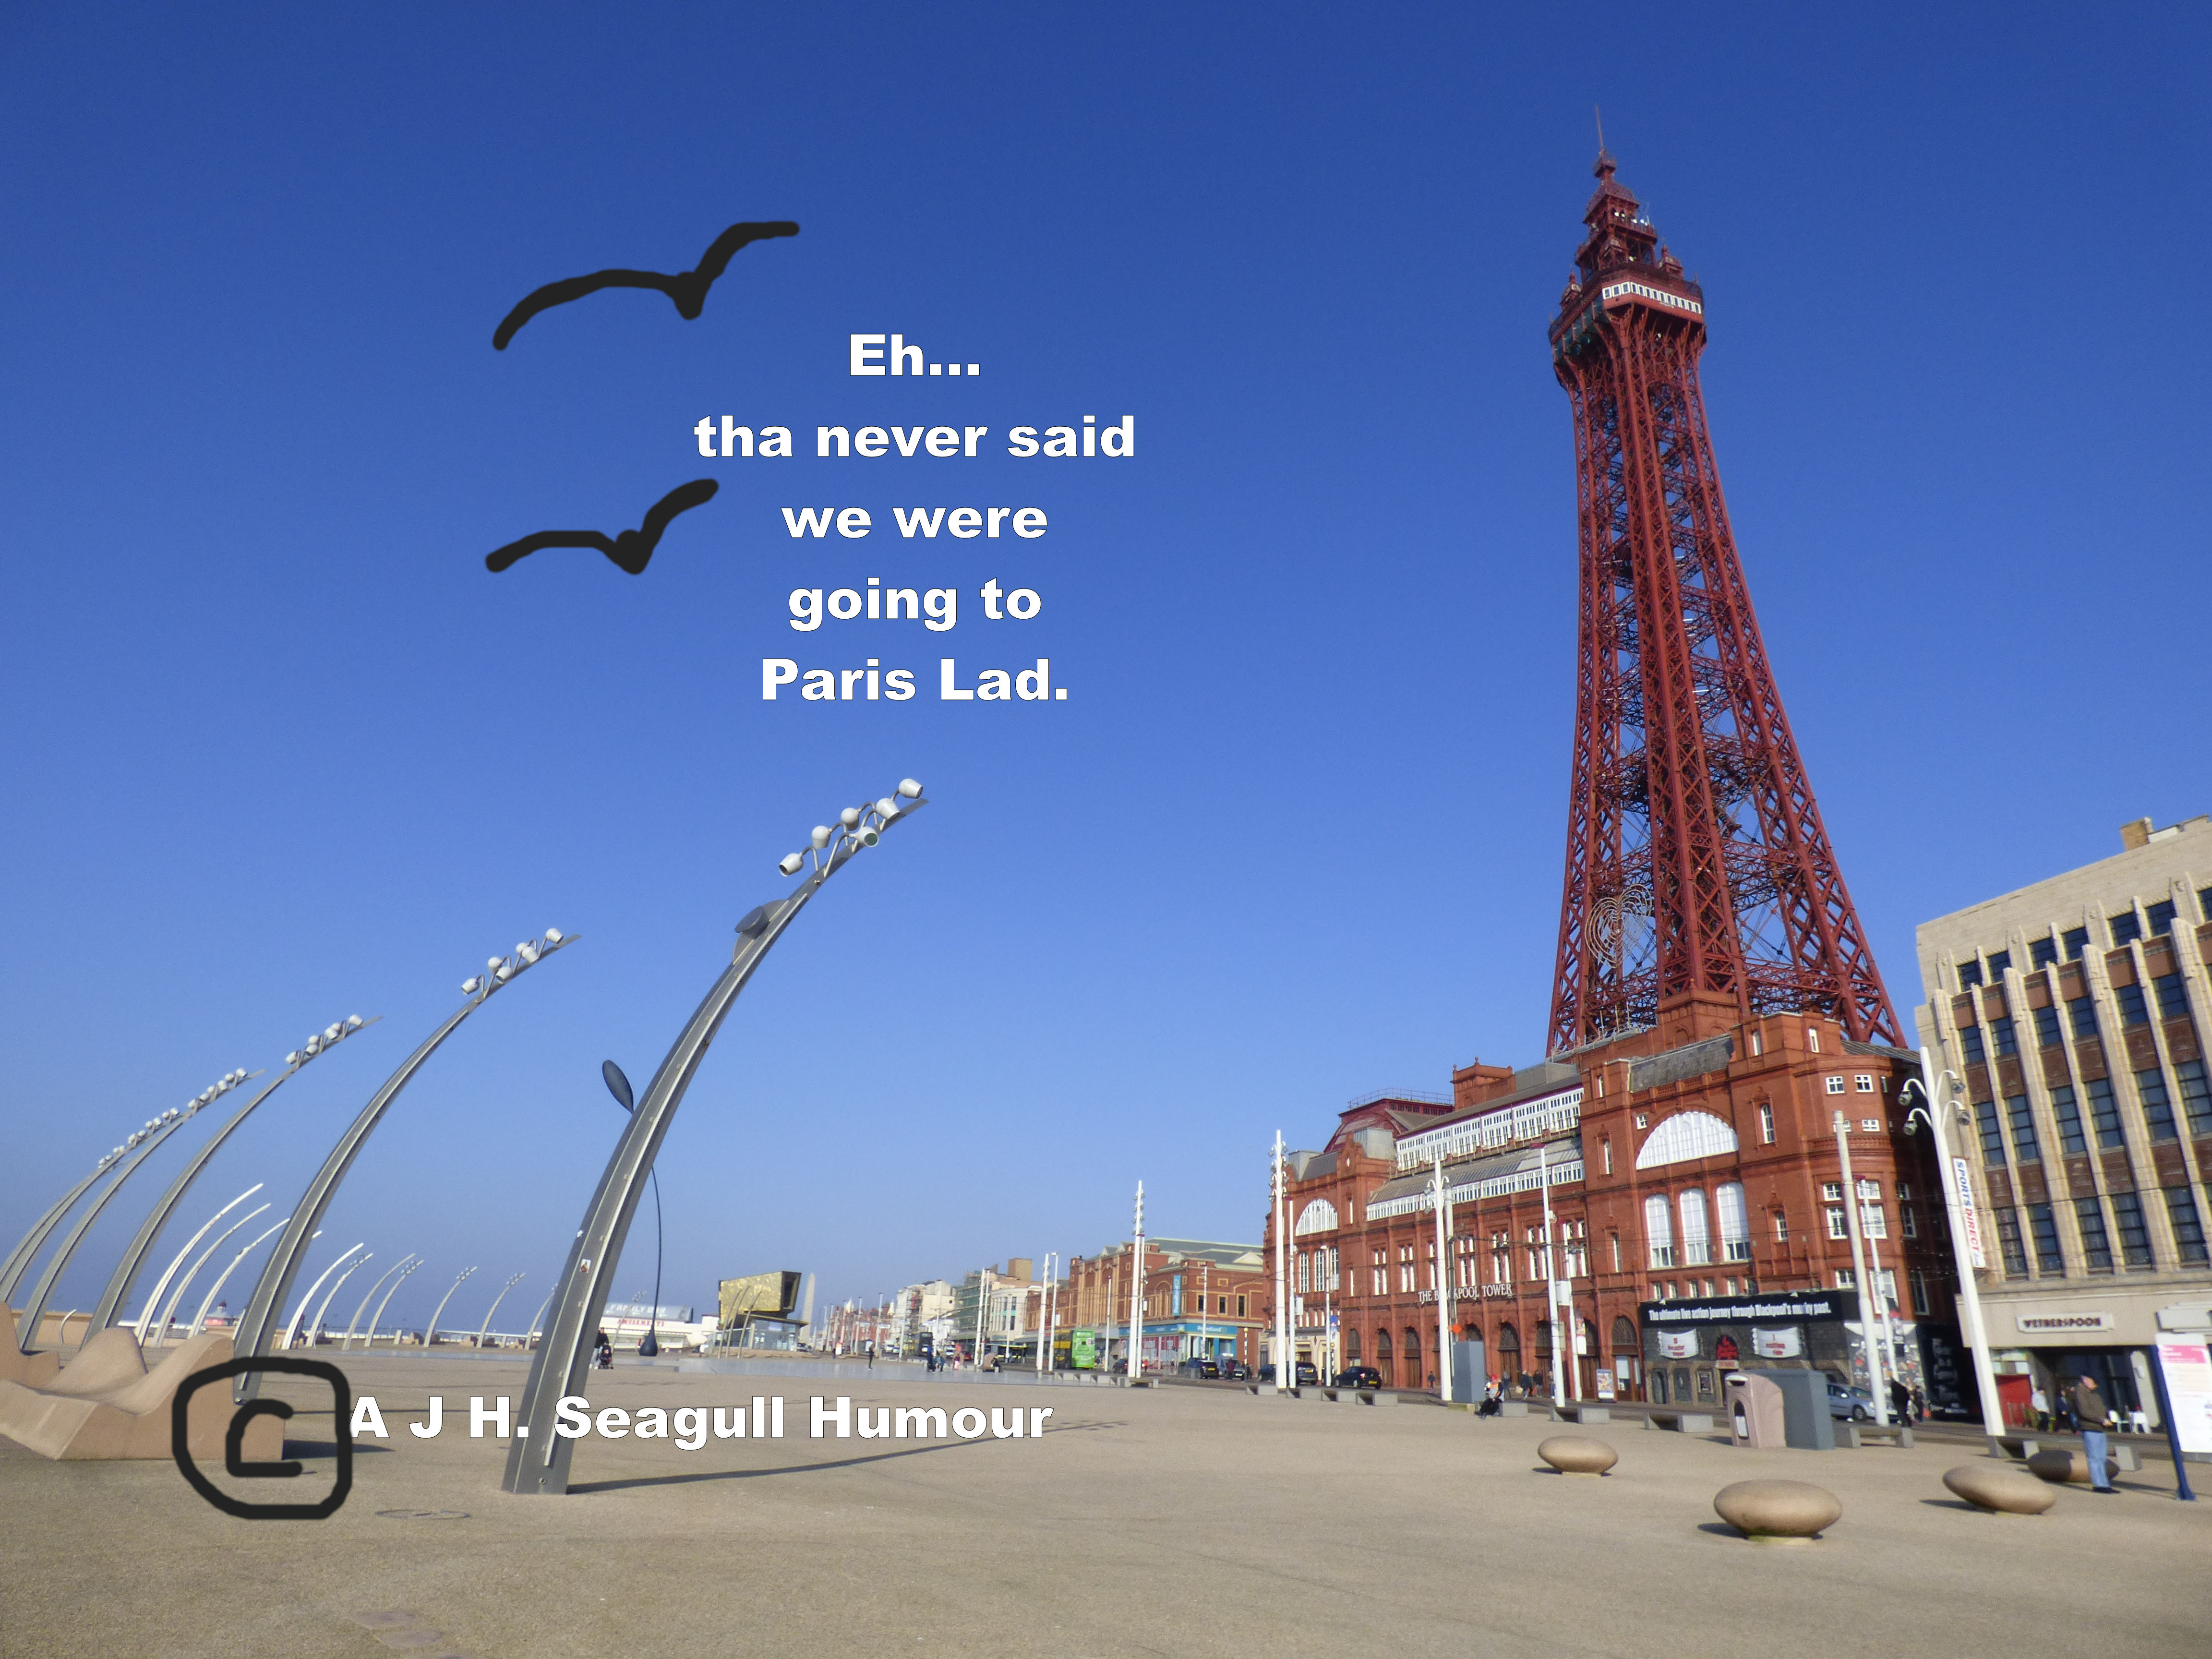 seagull humour